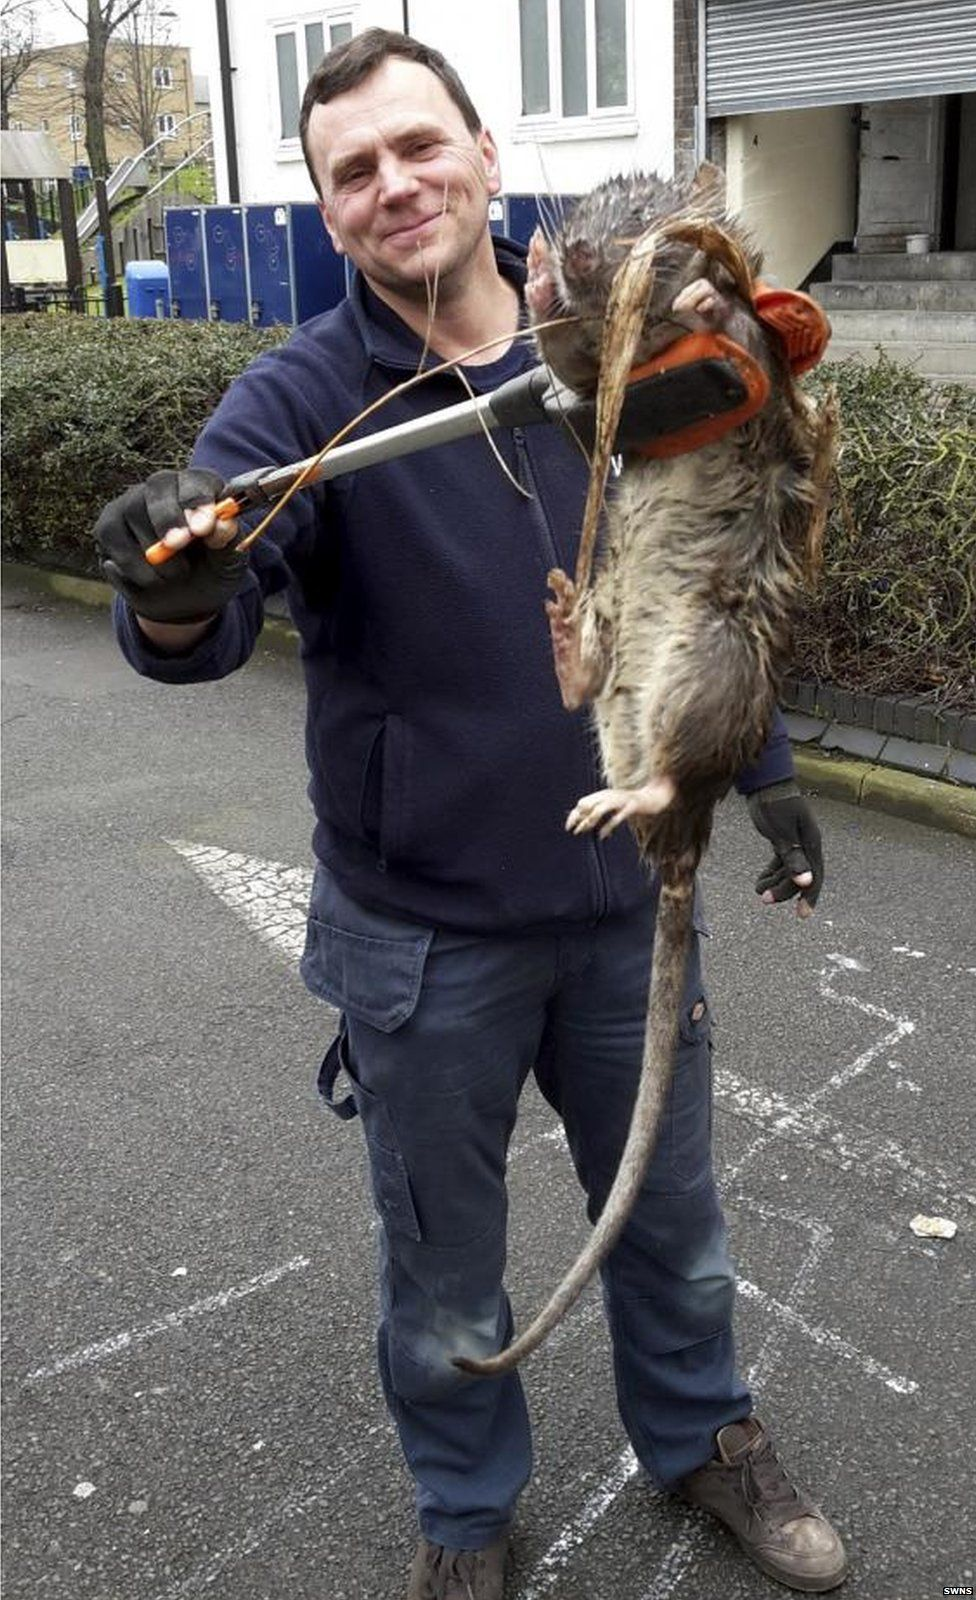 Hackney rat